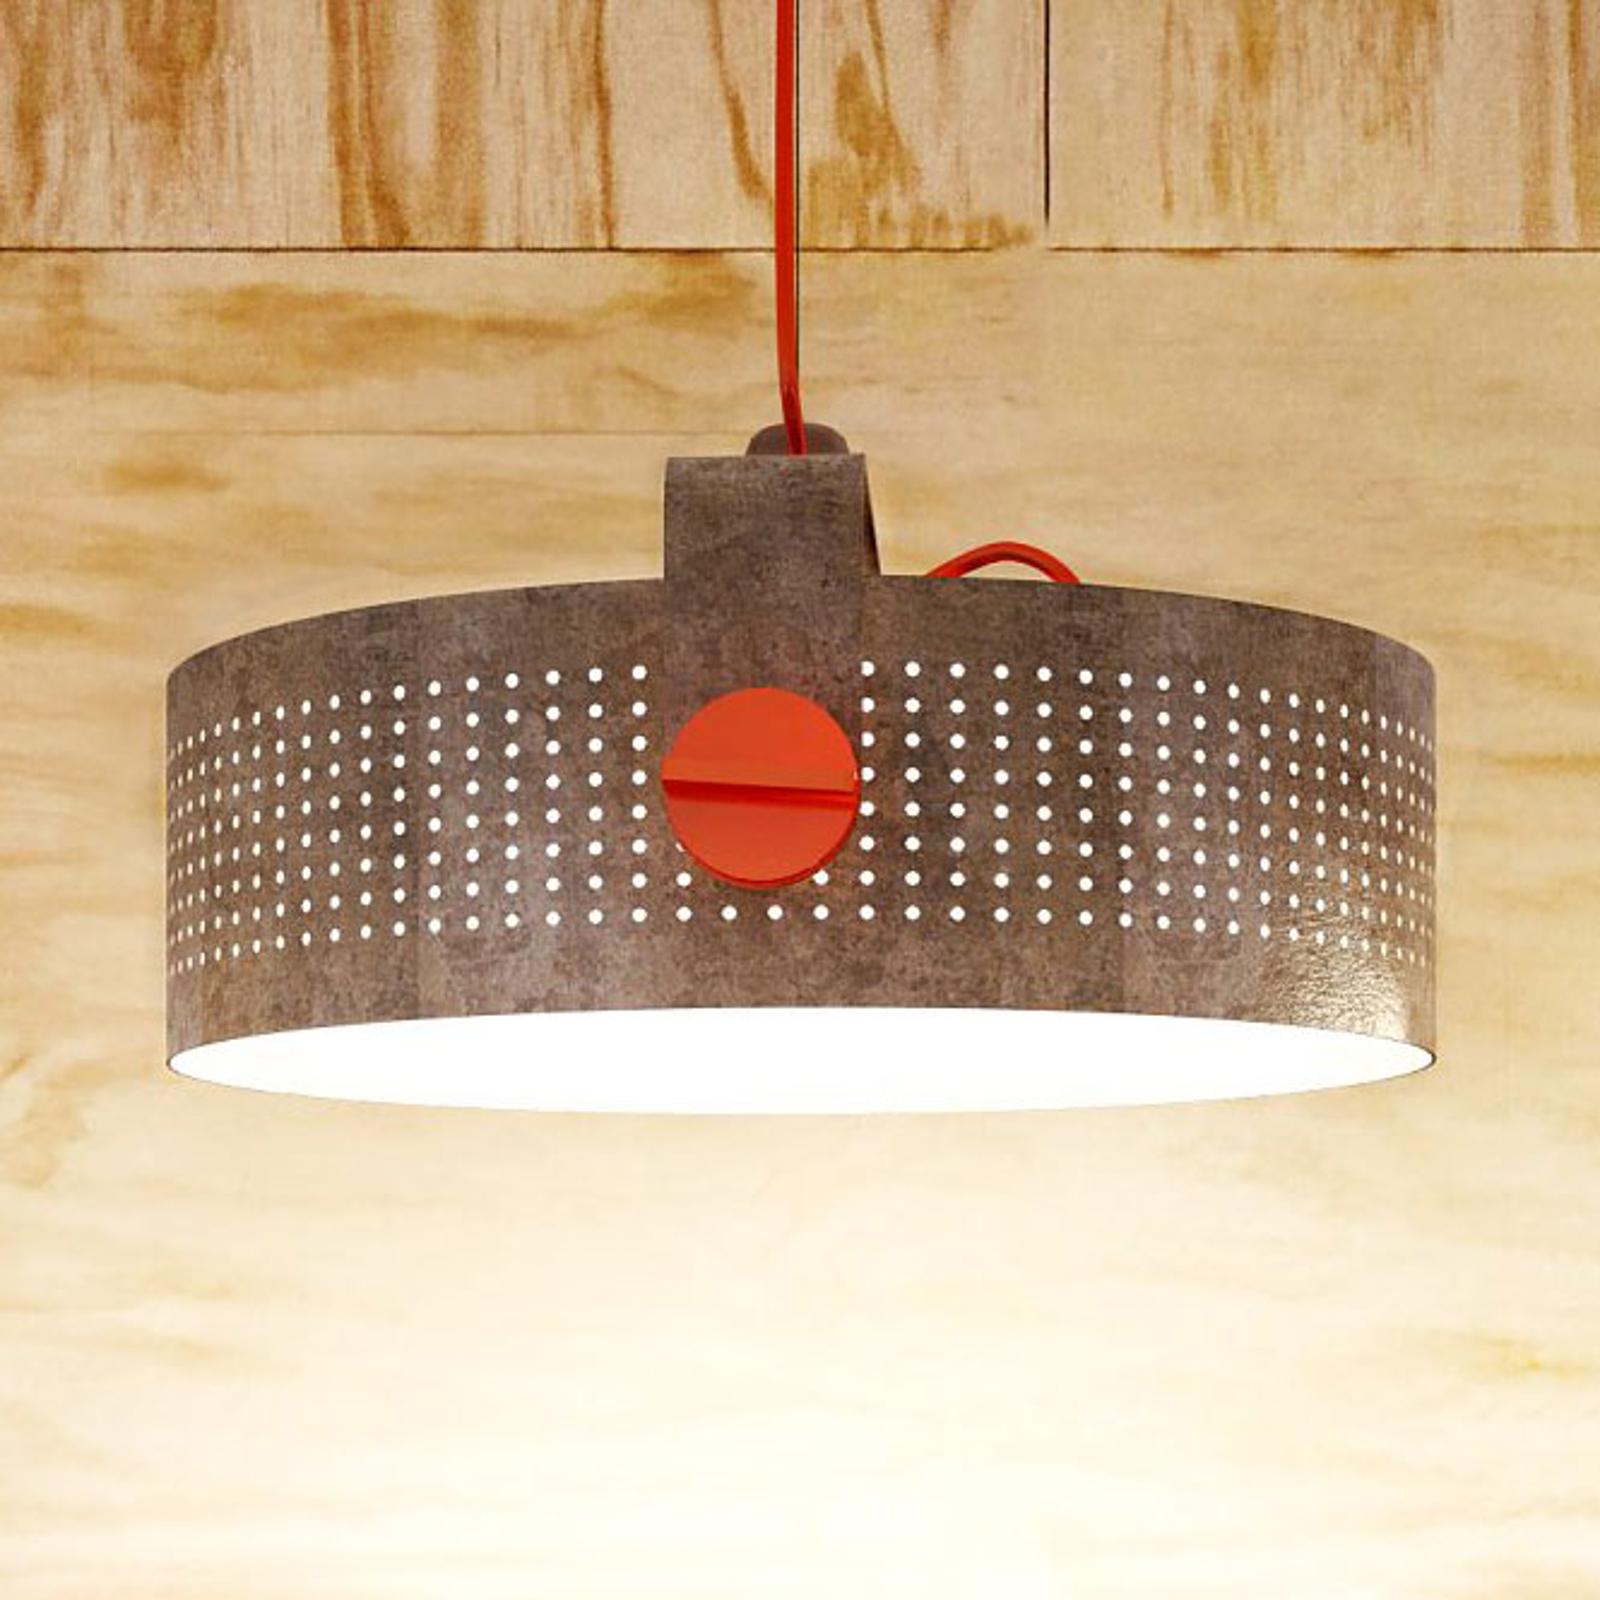 Martinelli Luce Modena LED-Hängelampe, cortenstahl